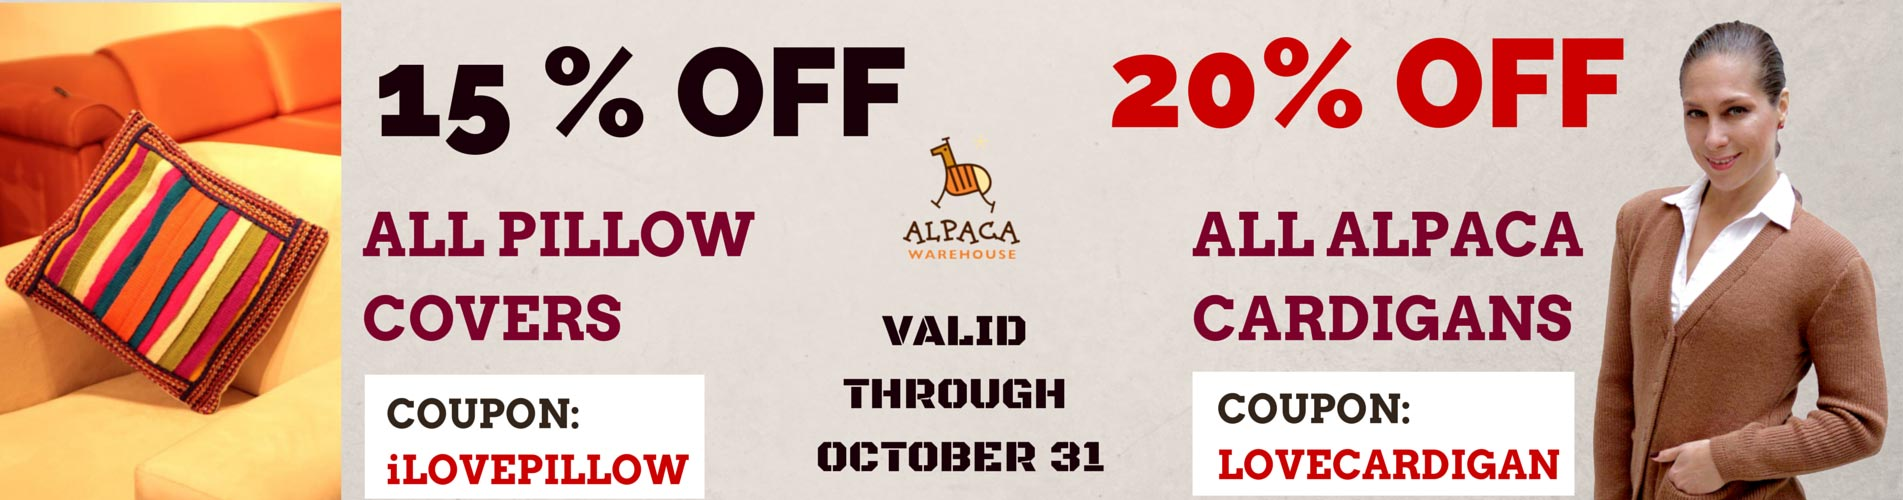 Alpaca Warehouse Discount Coupon Code